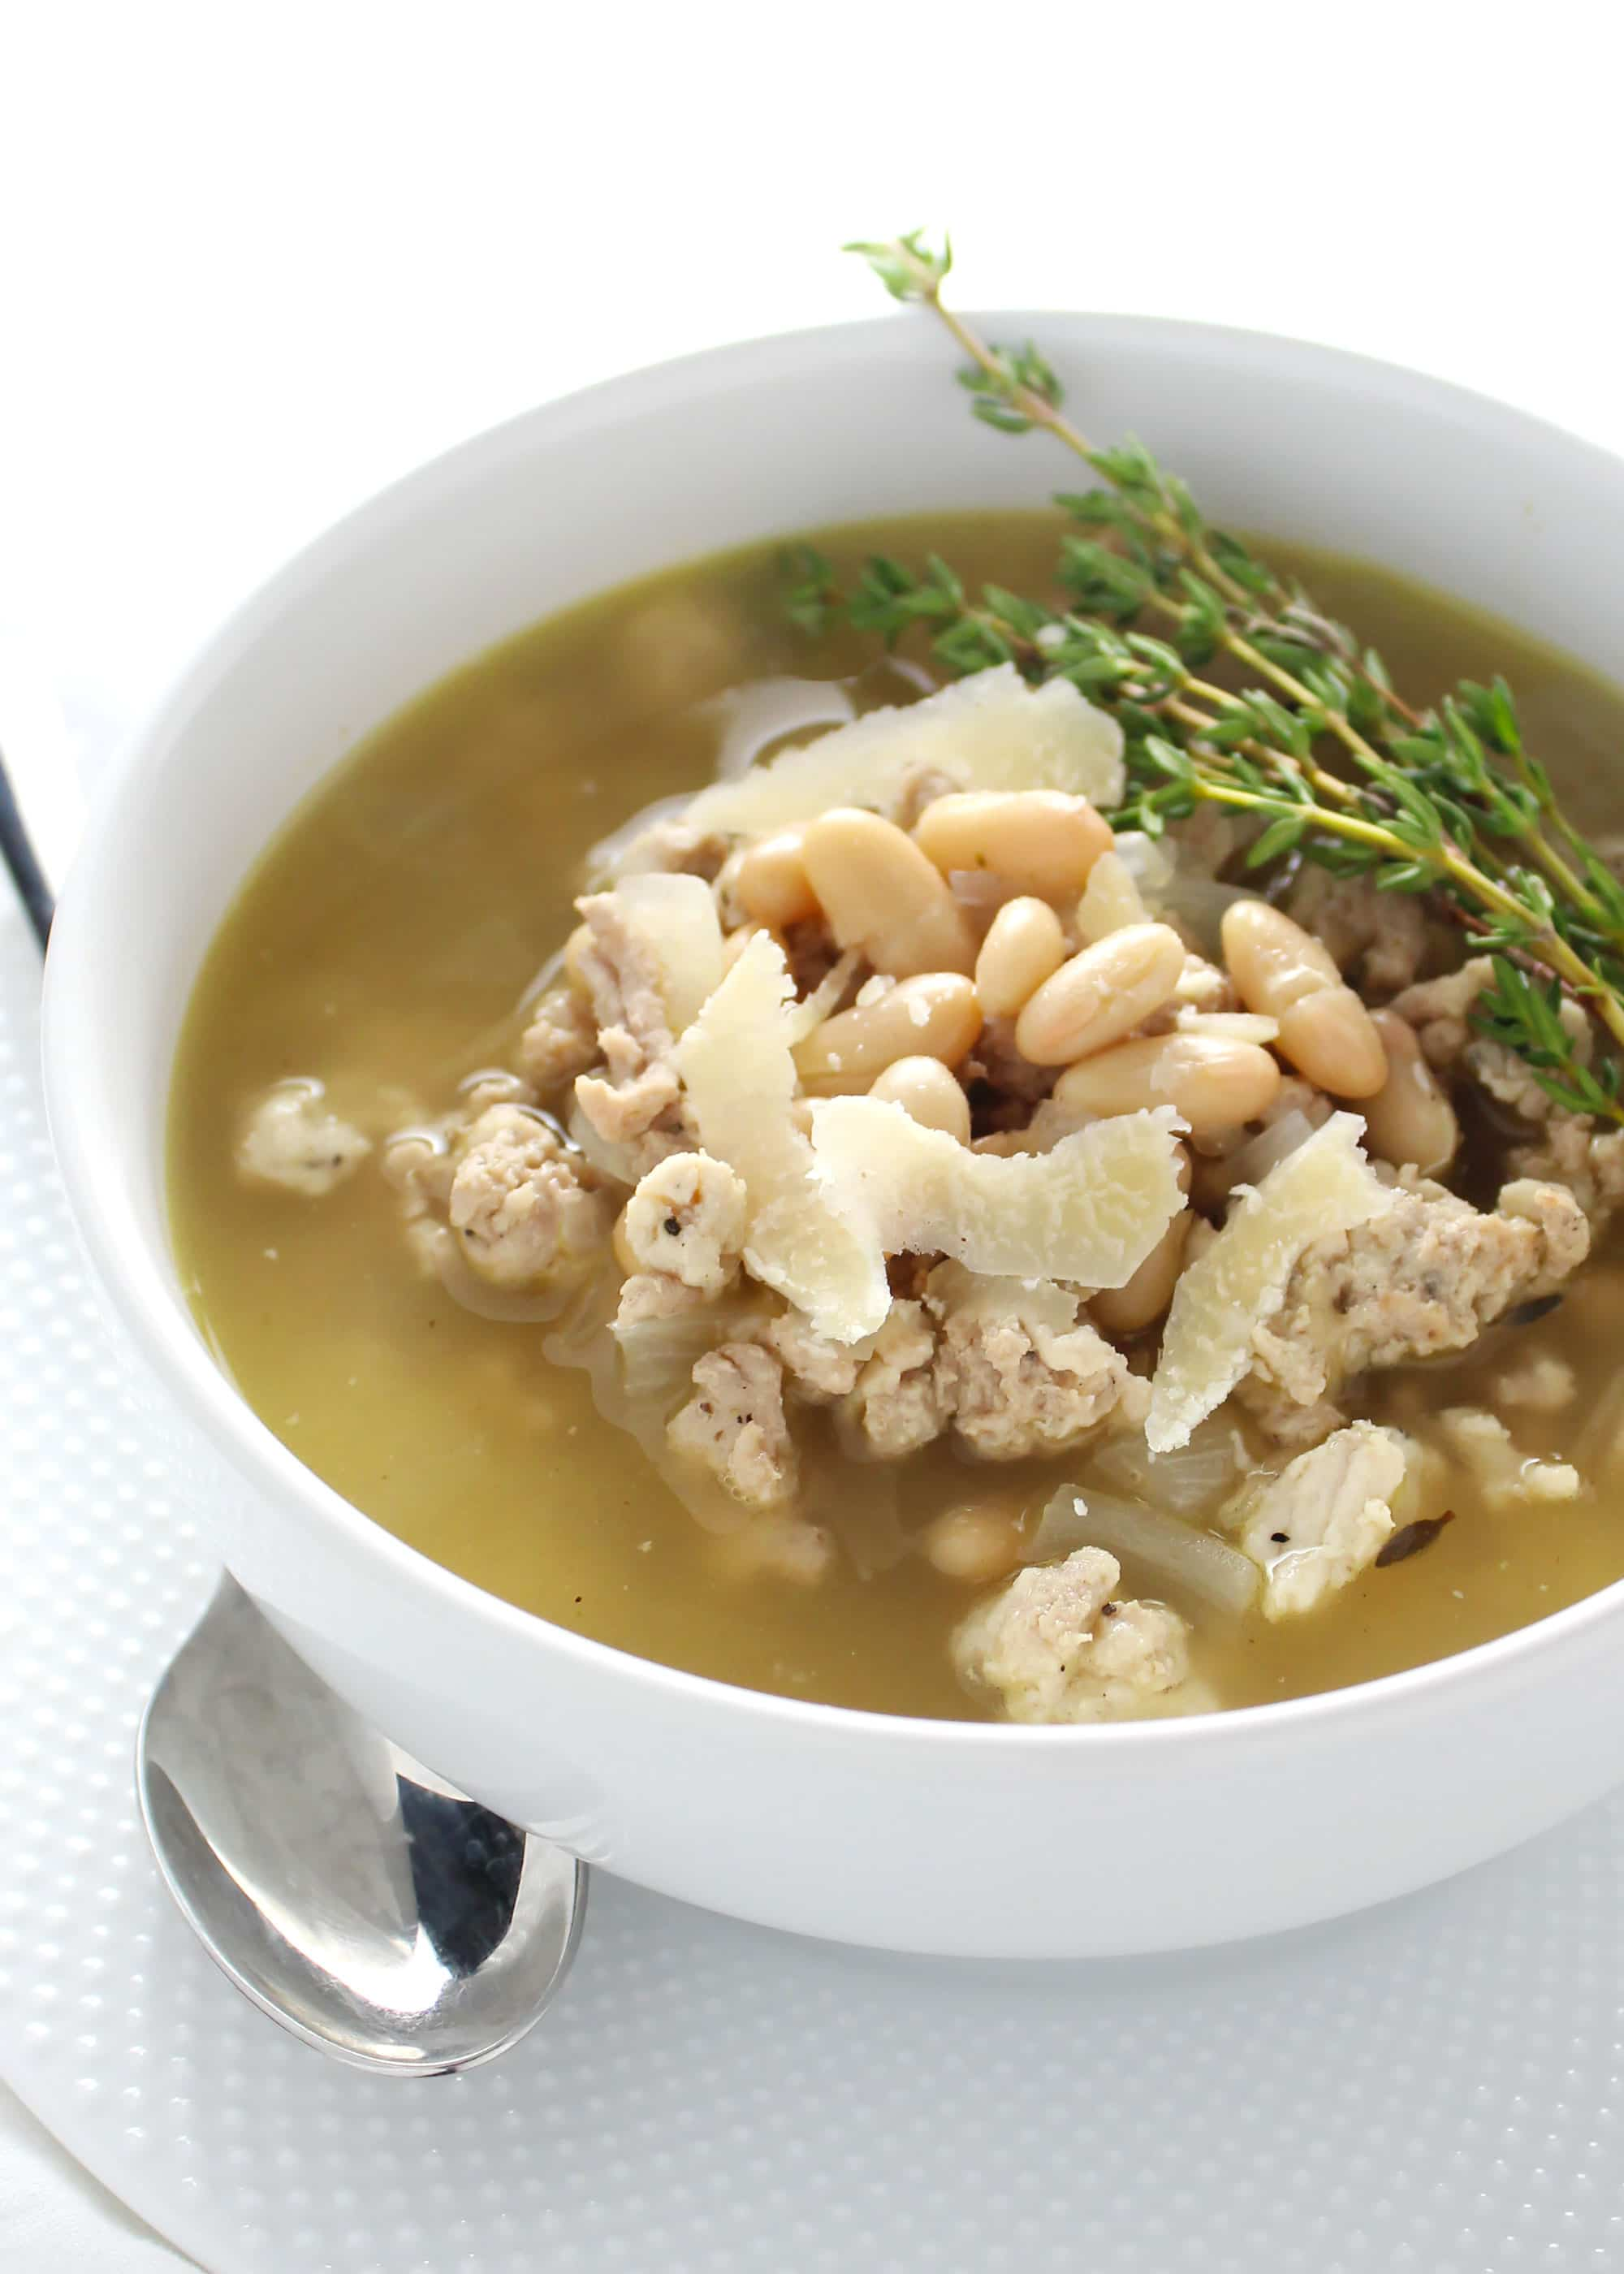 Tuscan white bean stew in white bowl